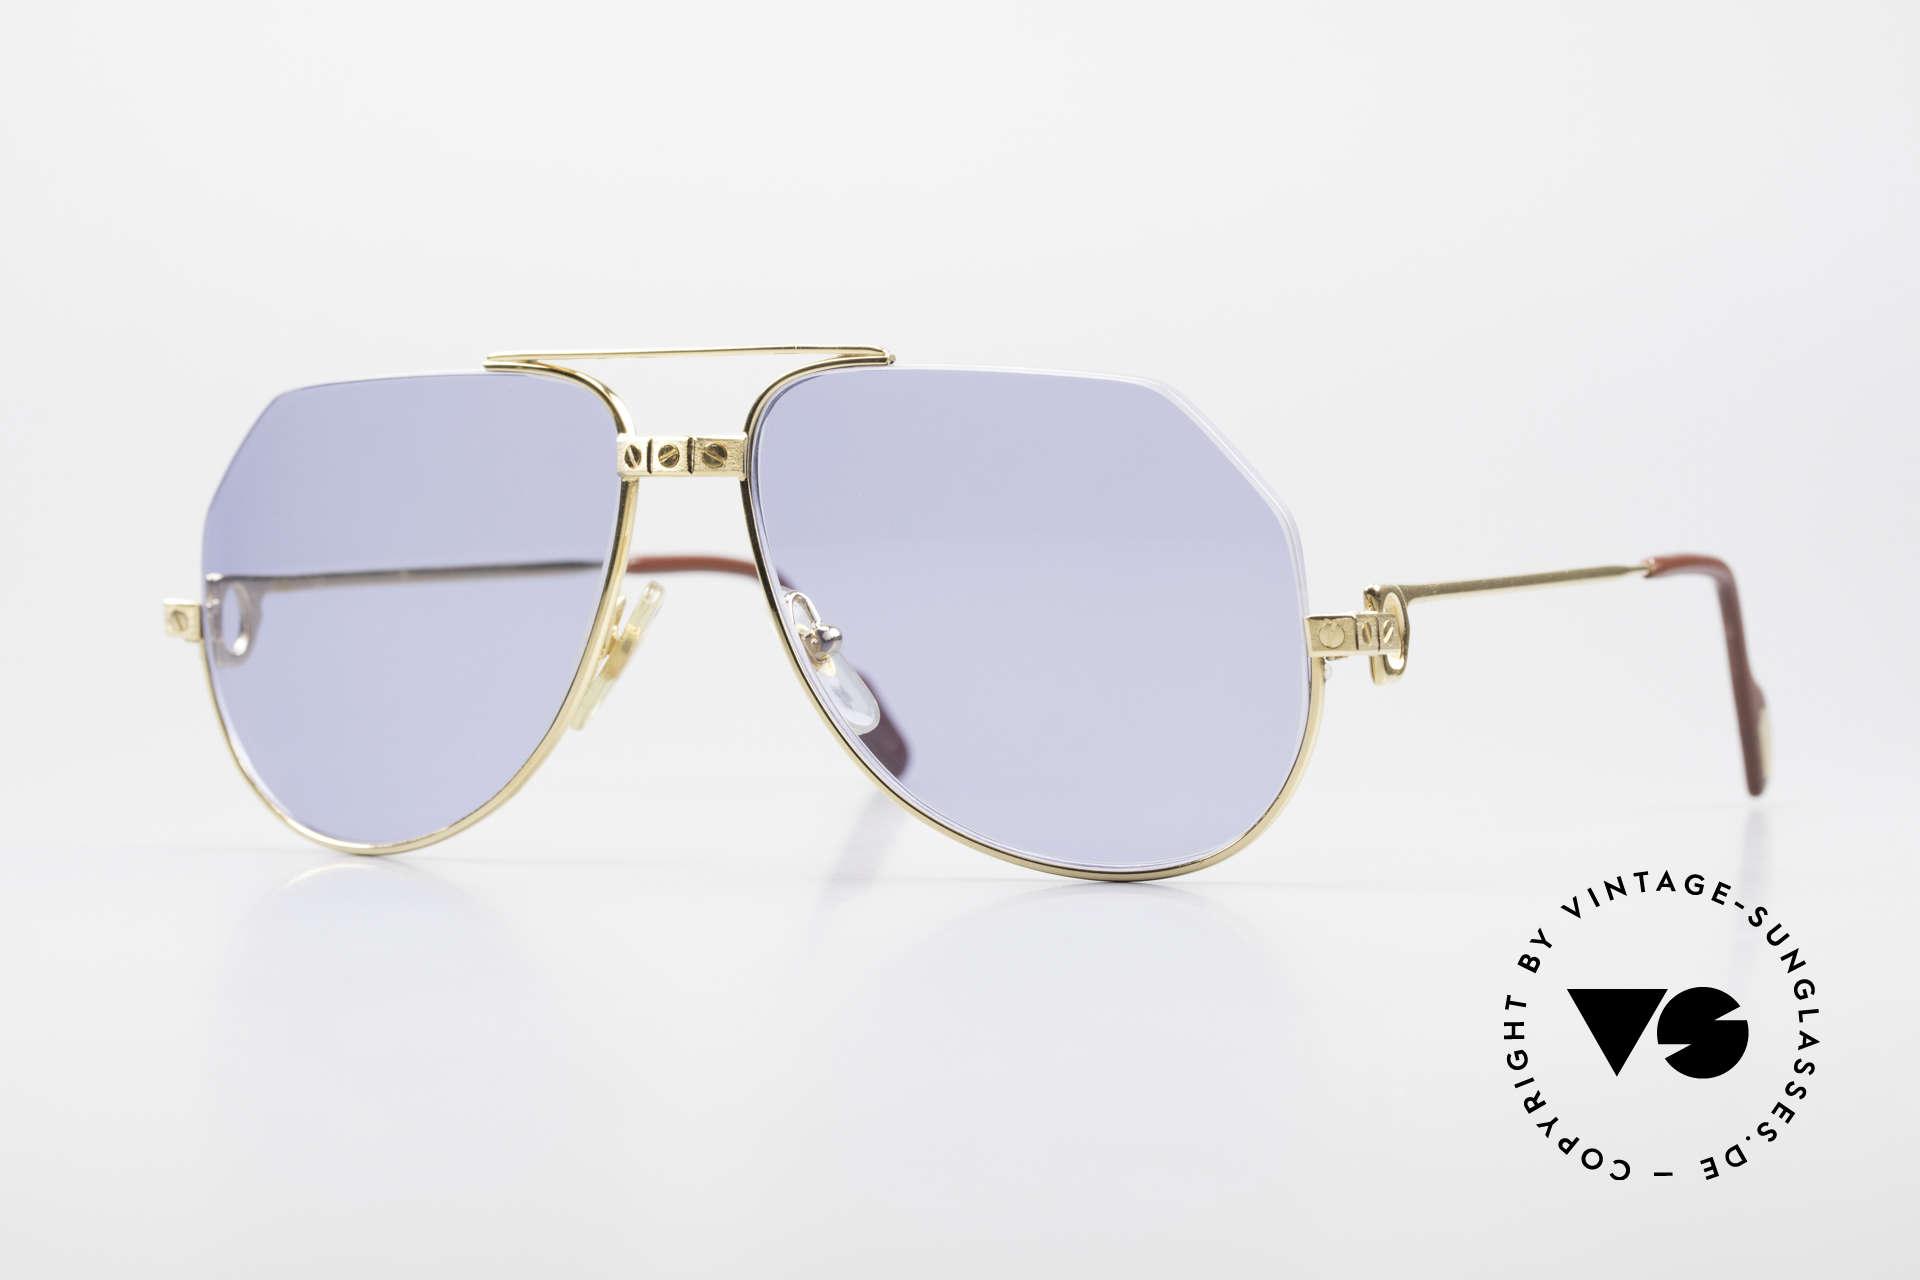 Cartier Vendome Santos - S One Of A Kind Nylor And Gold, unique Cartier Vendome sunglasses, SMALL size 56°14, Made for Men